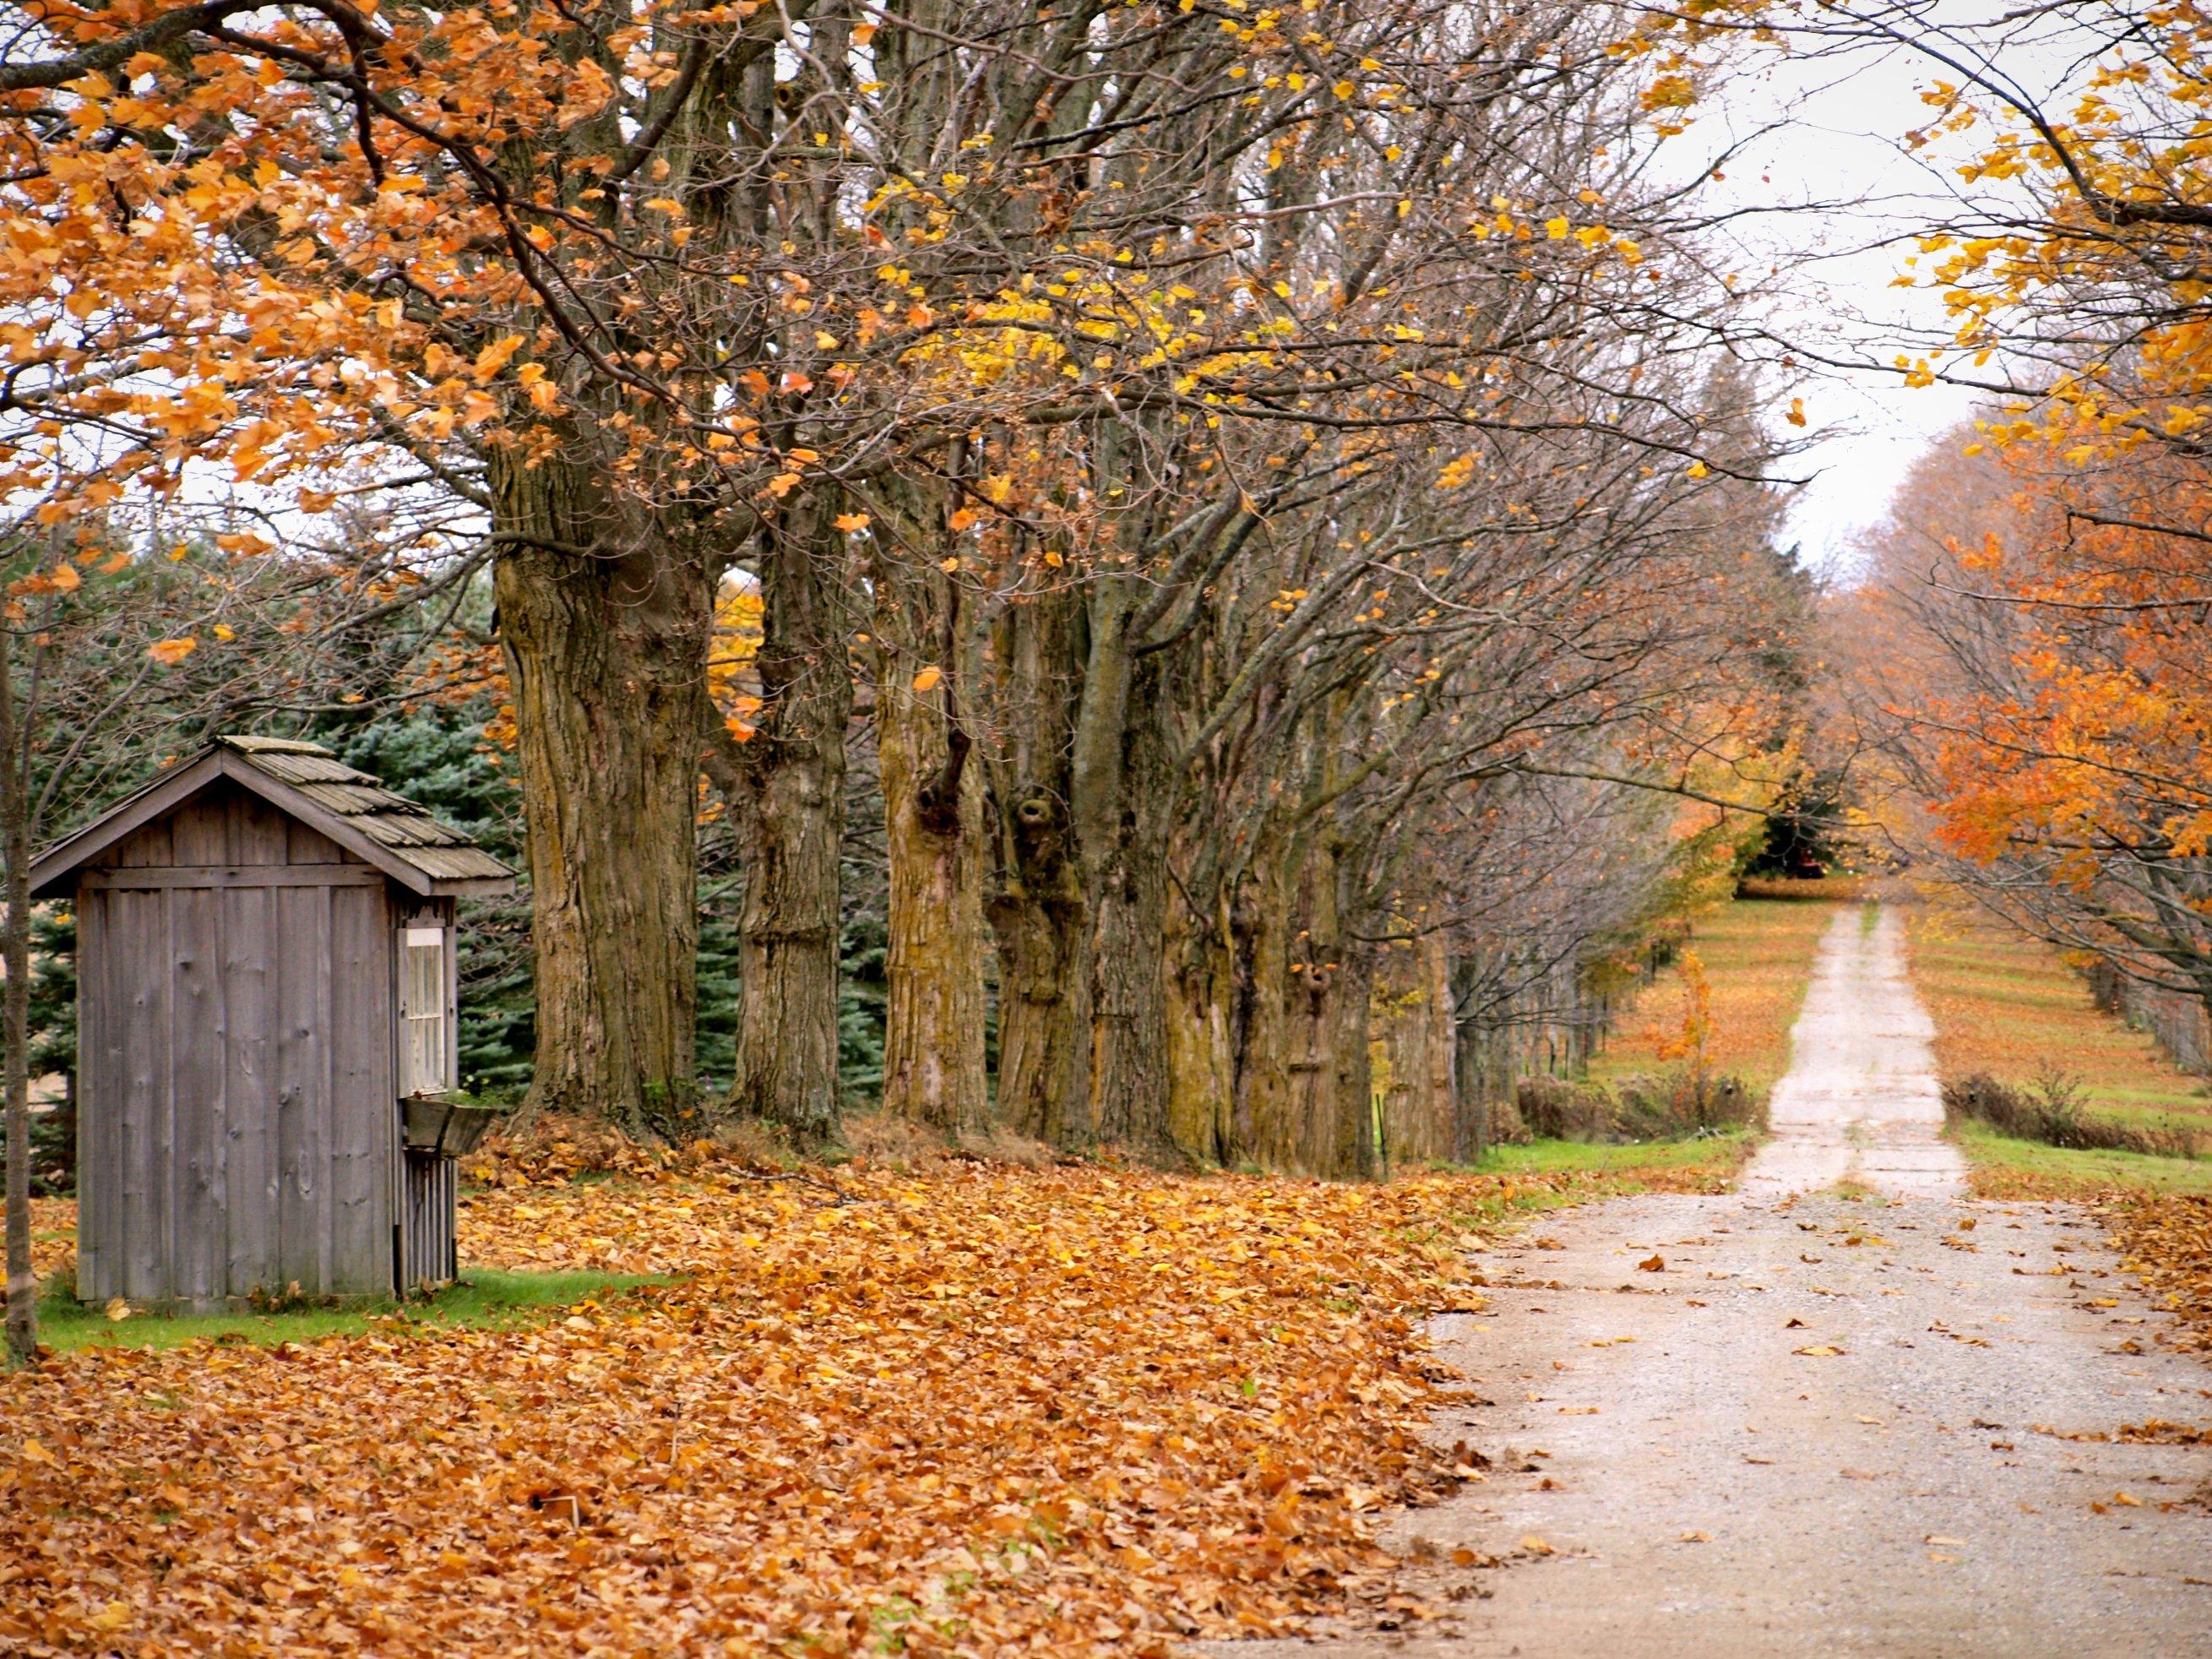 File:Fallen Leaves October 2011.jpg - Wikimedia Commons